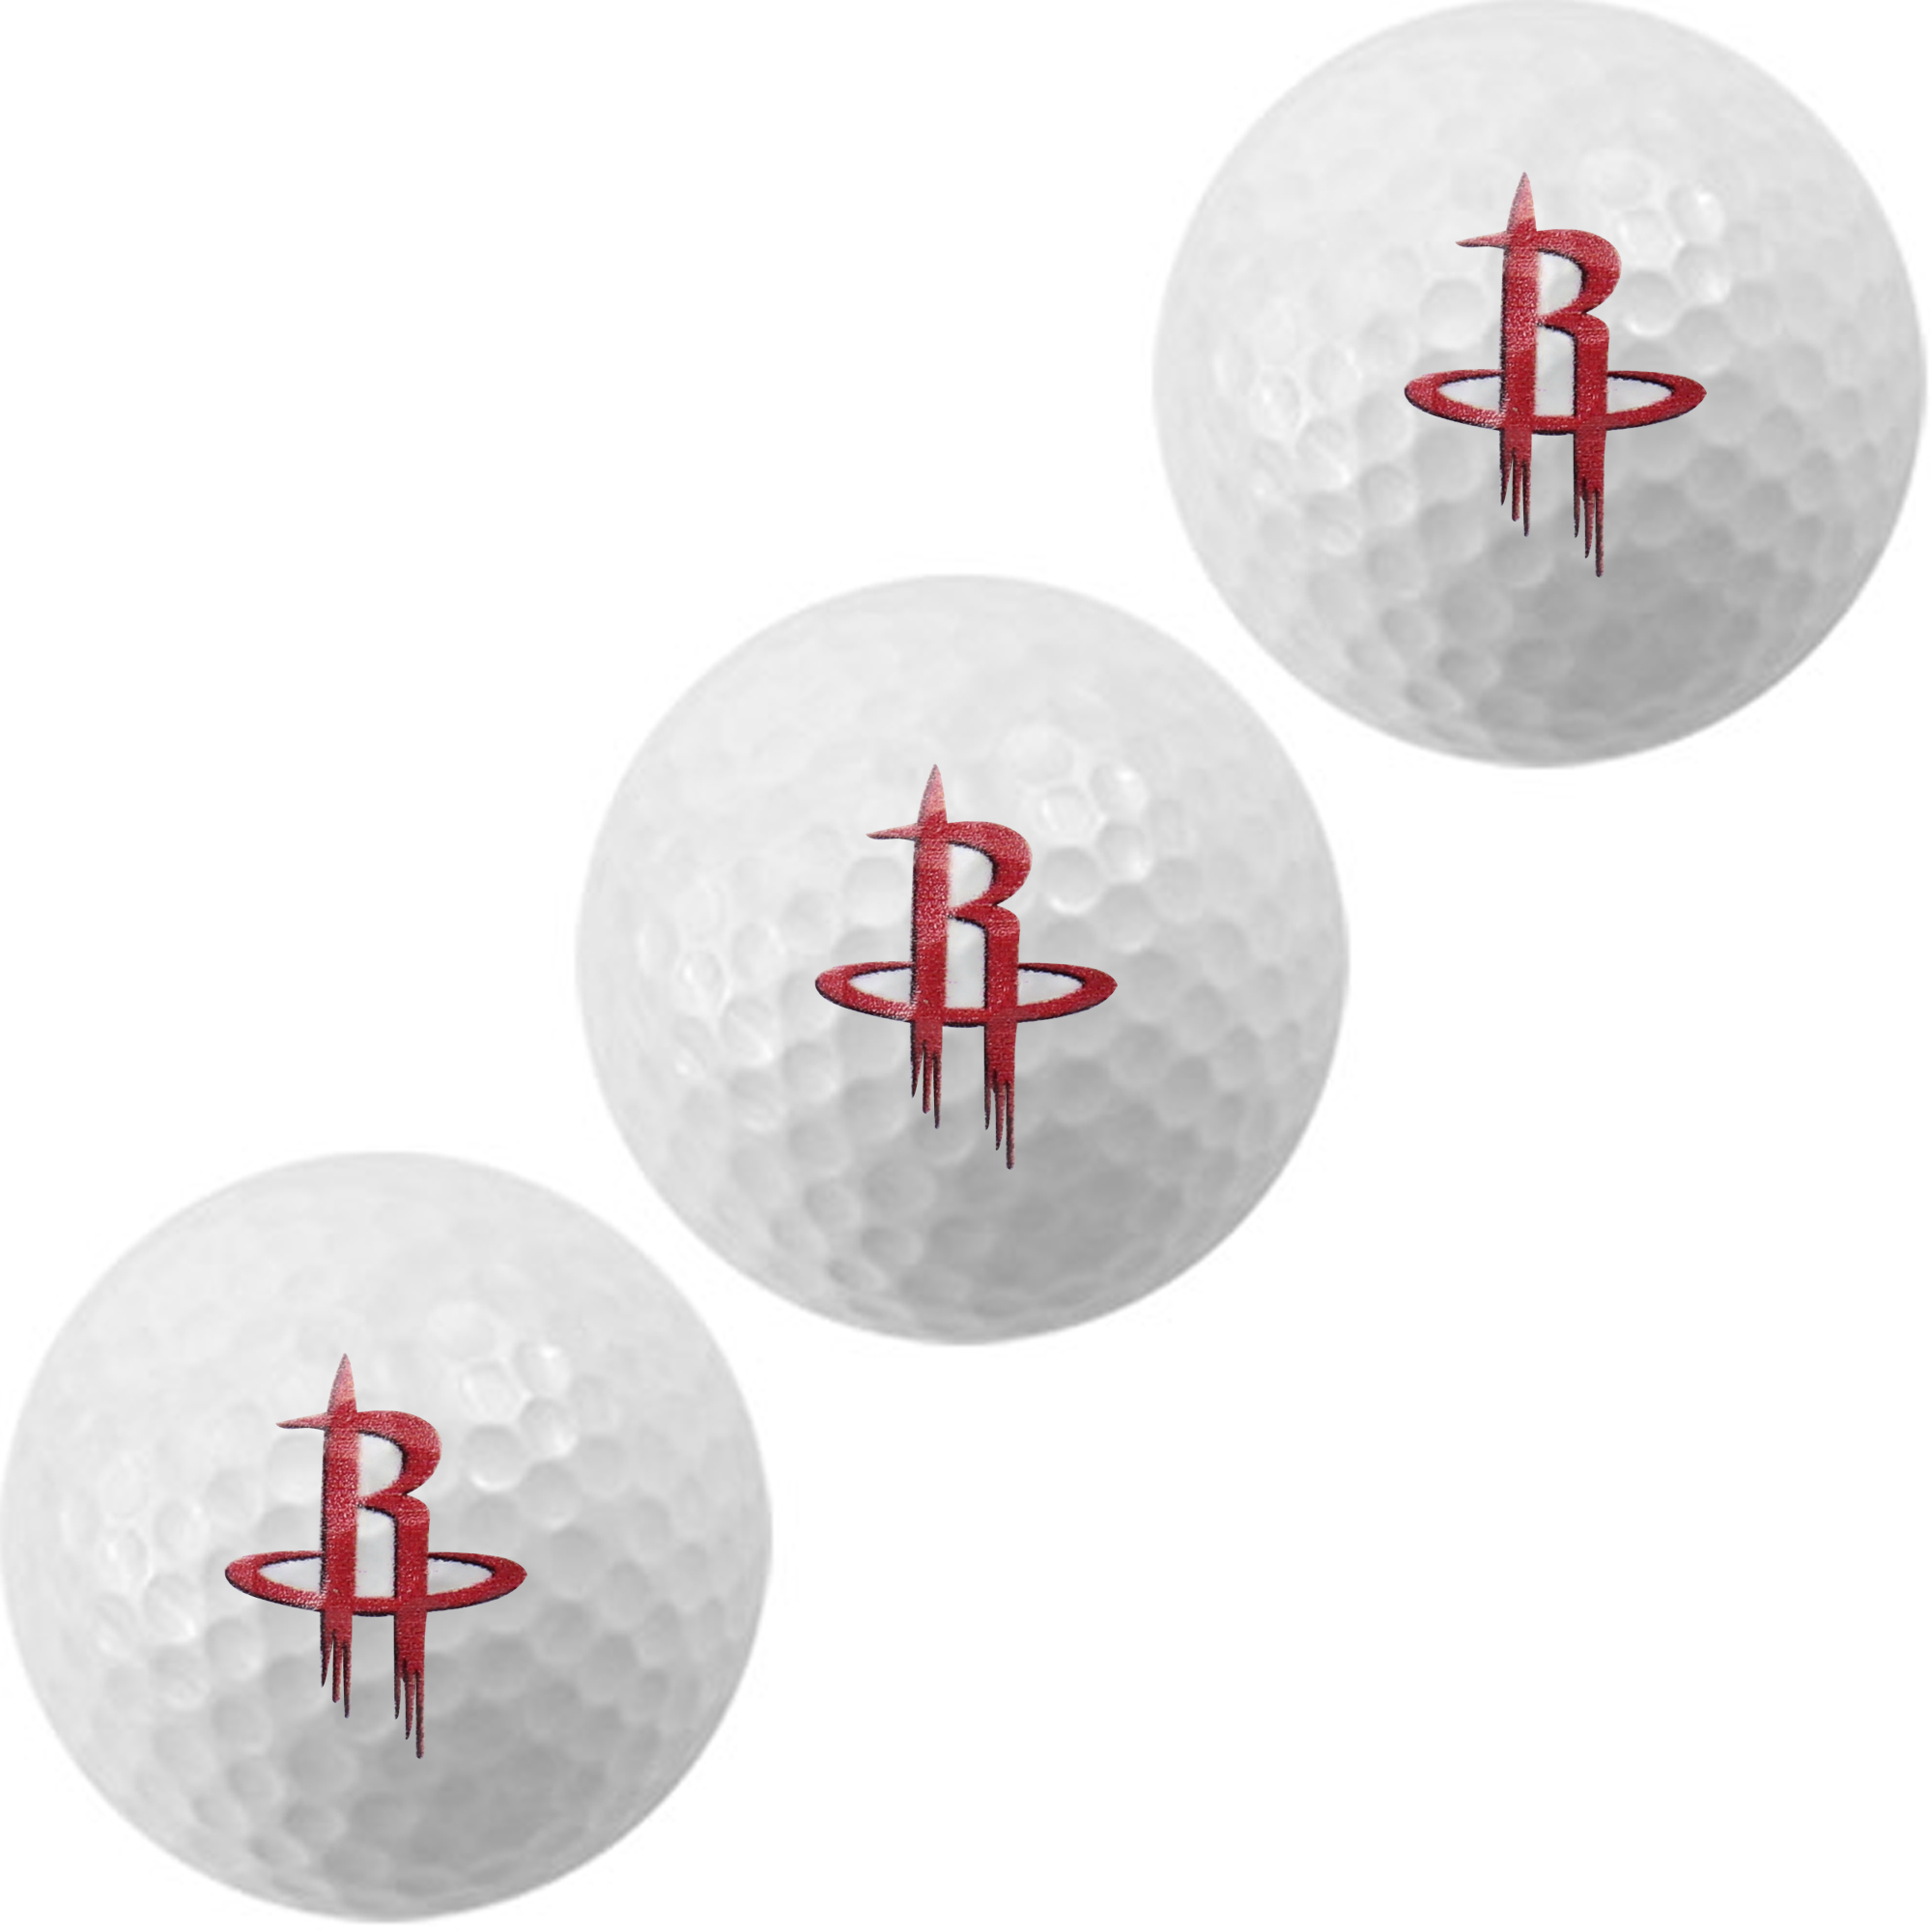 Houston Rockets WinCraft 3-Pack Golf Balls - No Size